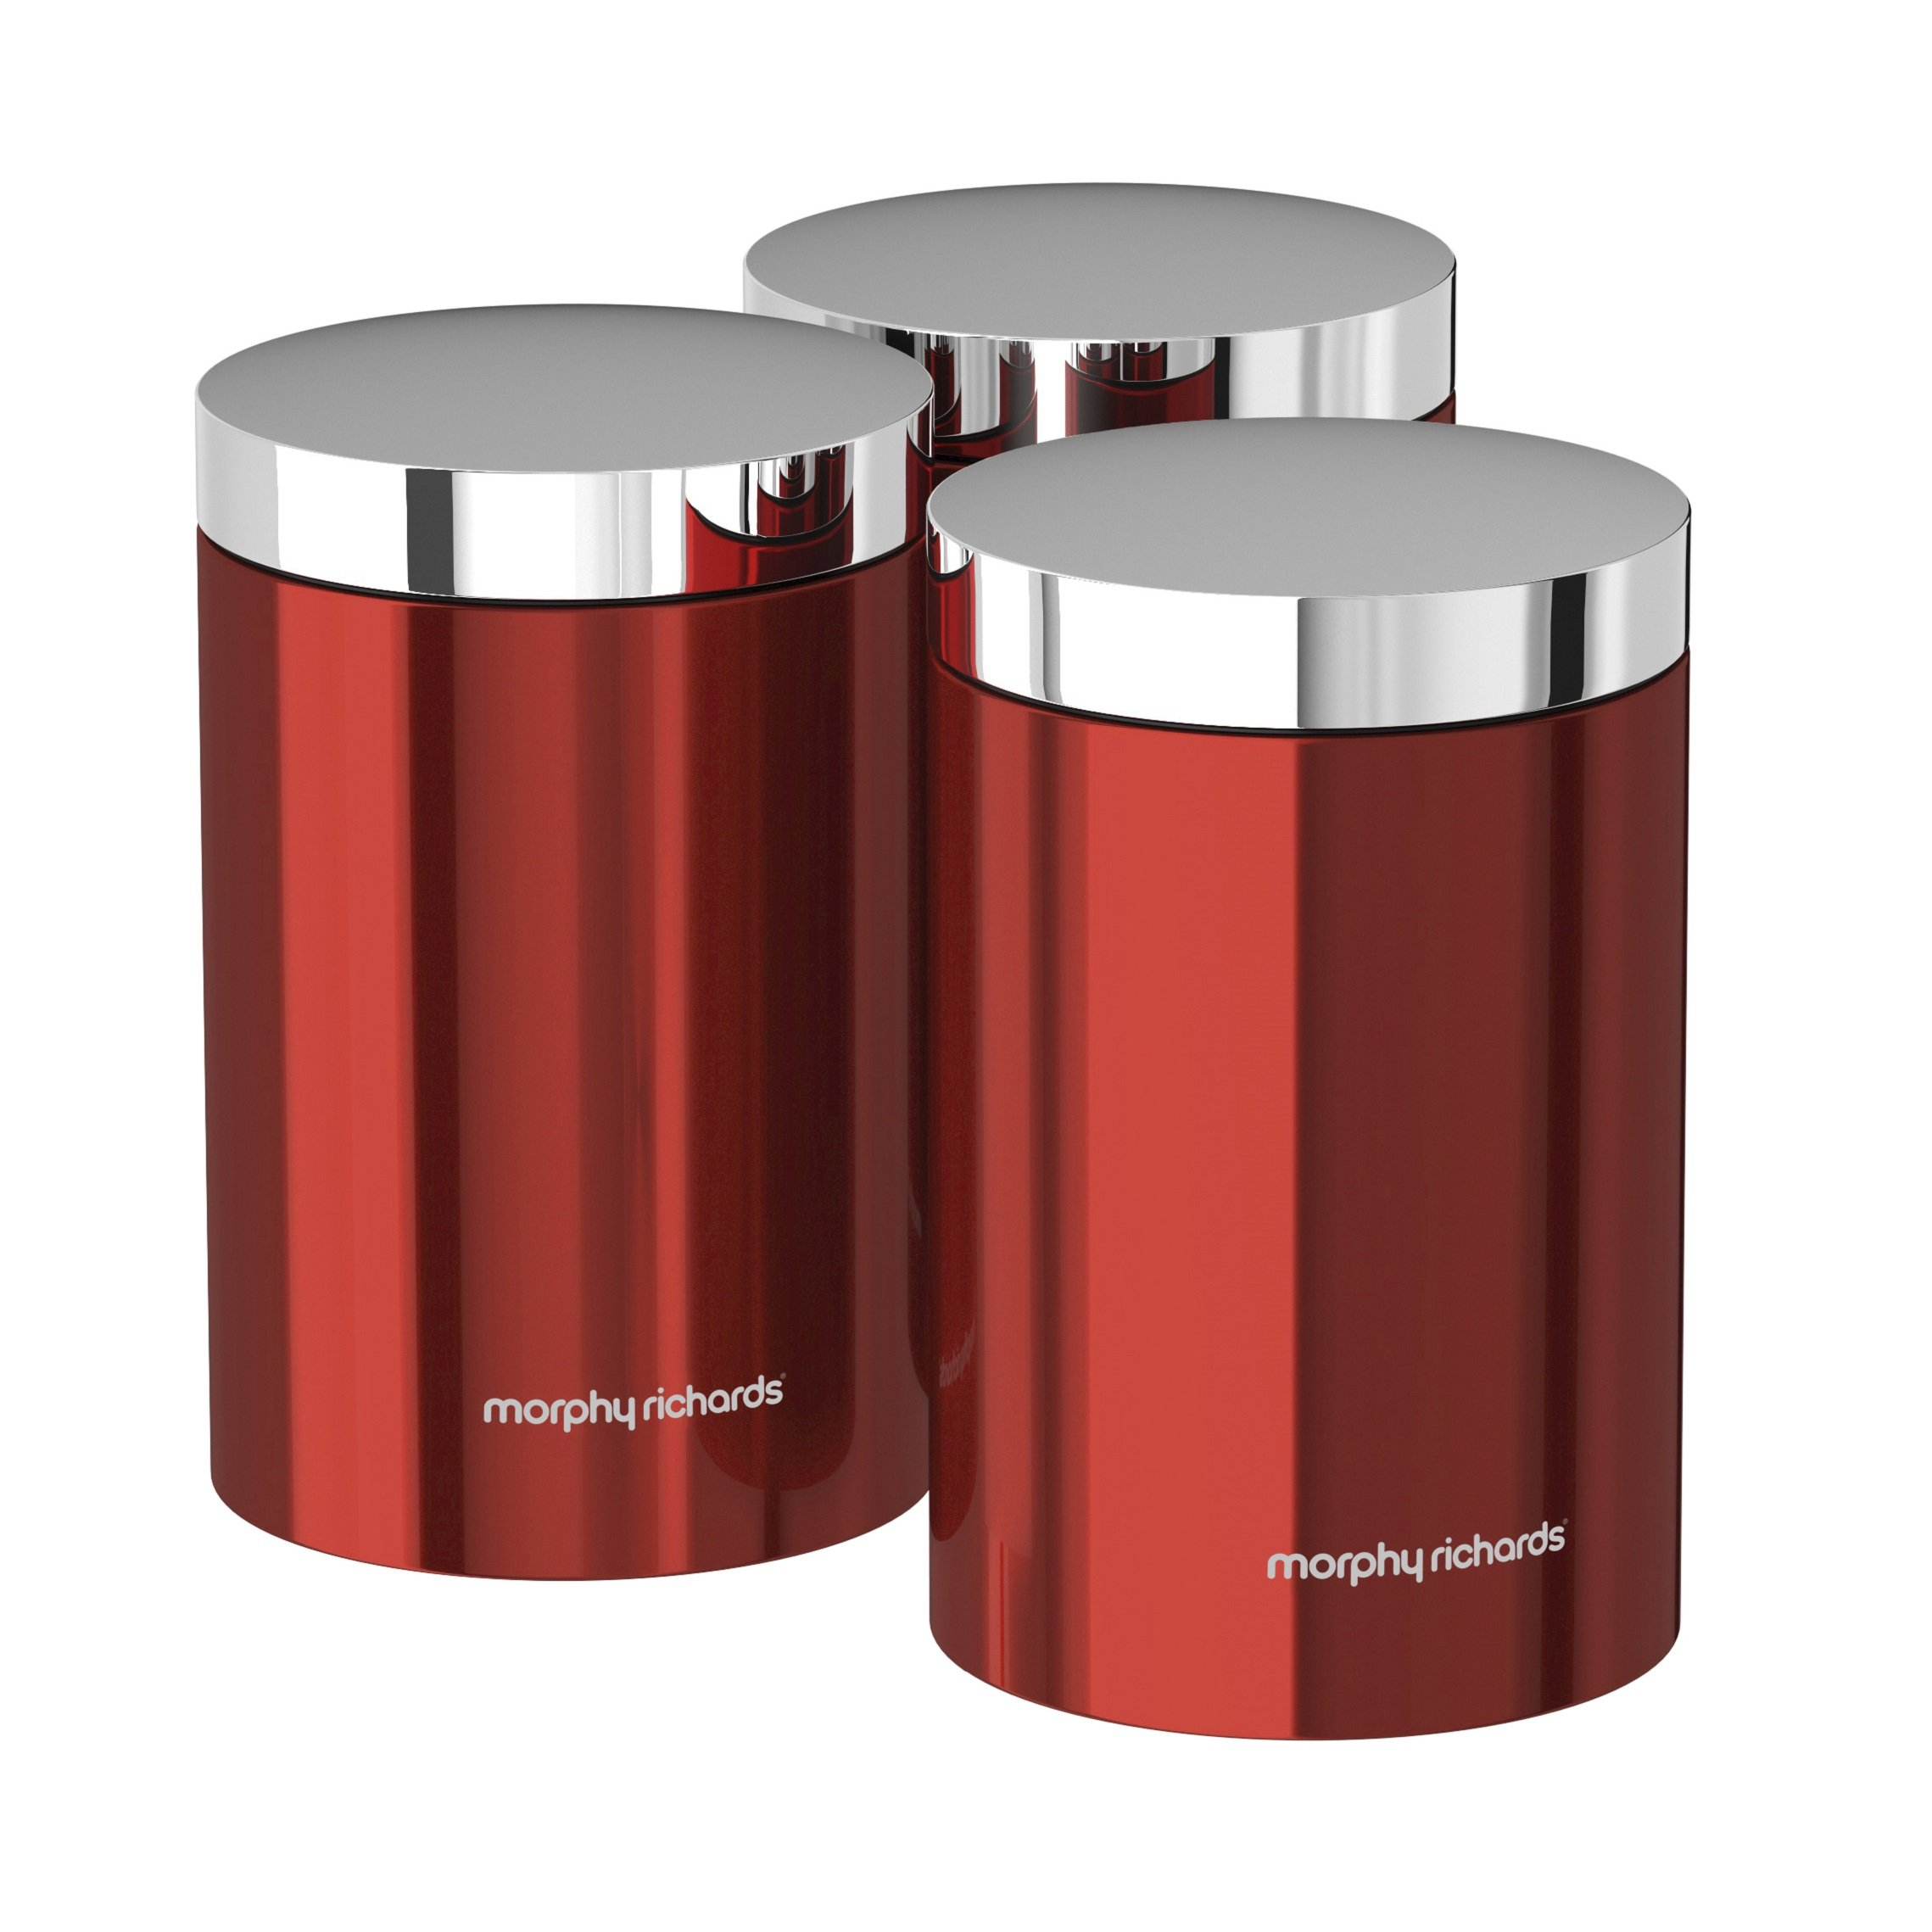 Morphy Richards Kitchen Set: Morphy Richards Set Of 3 Storage Canisters